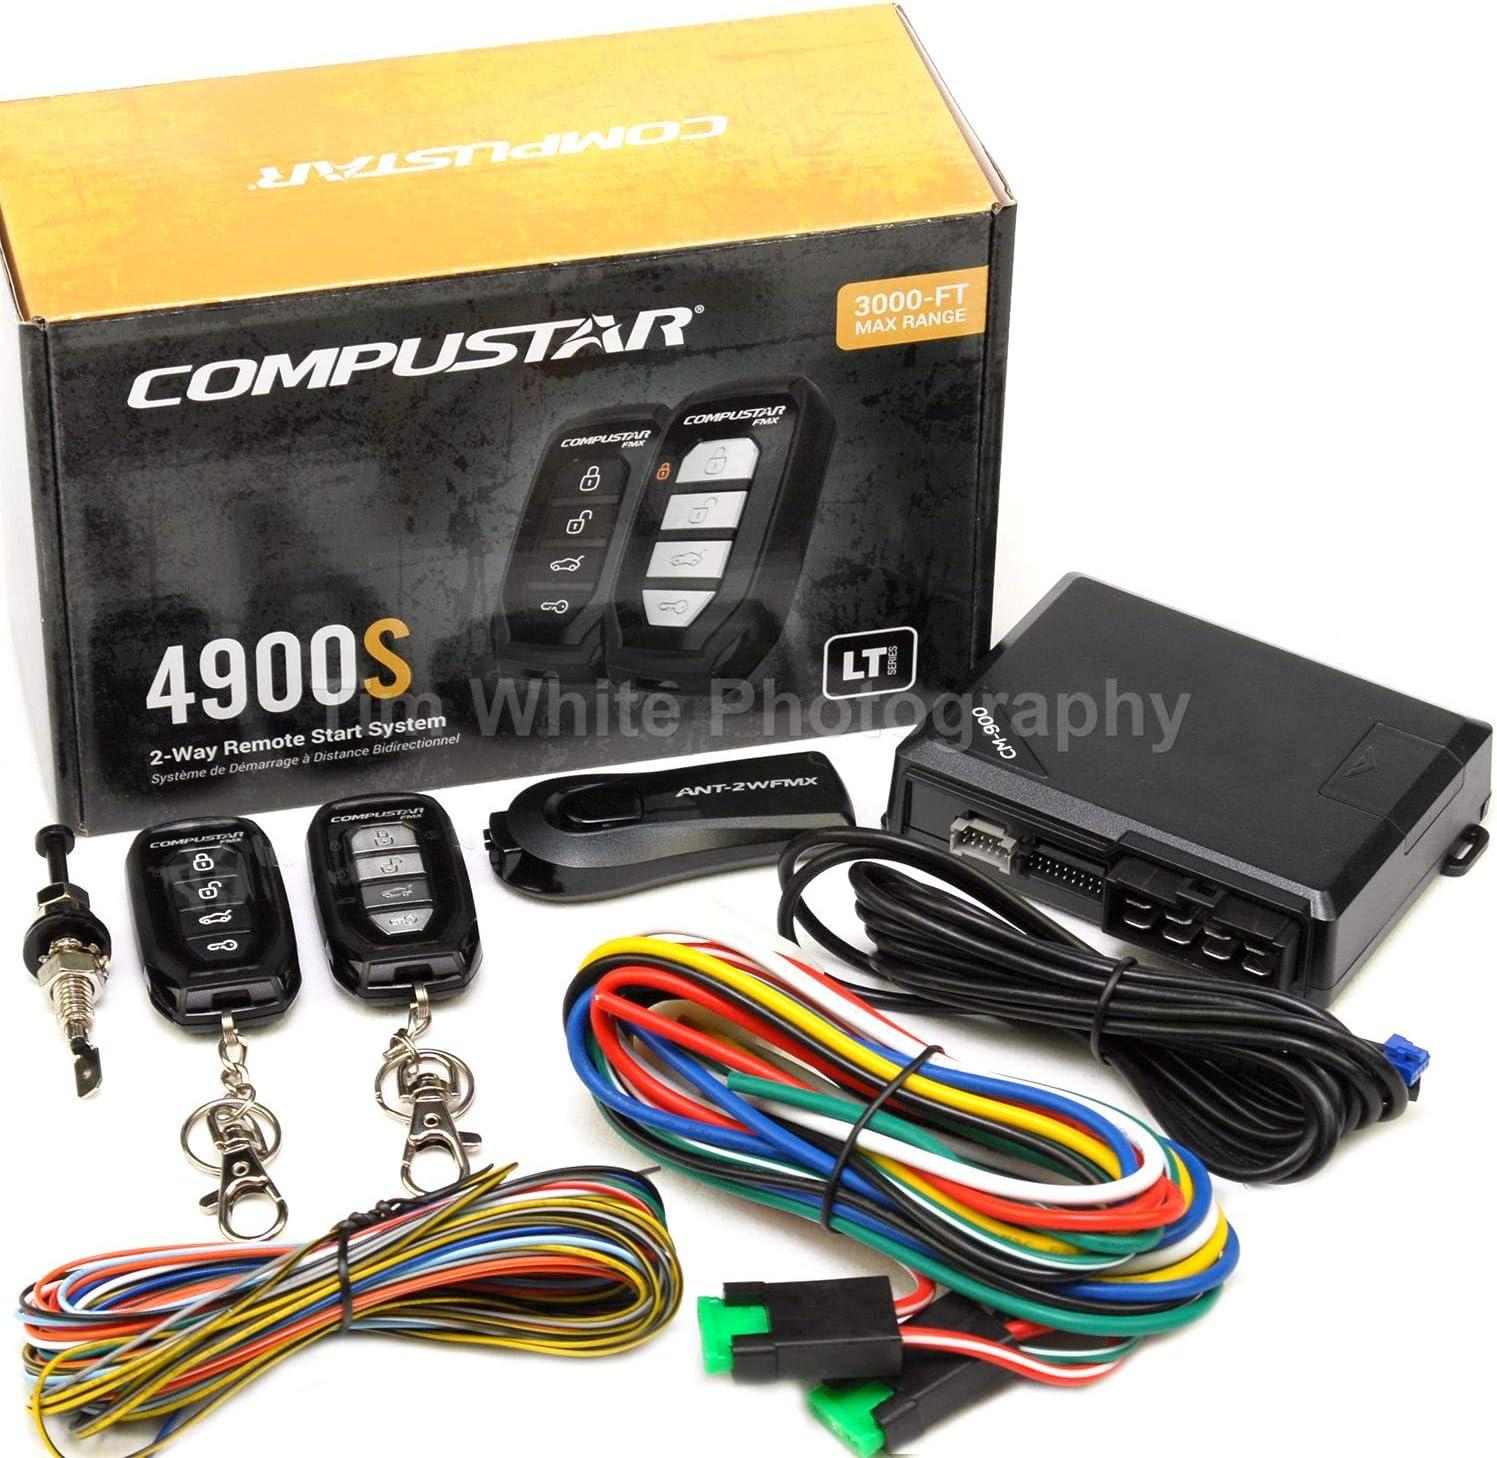 Amazon.com: Compustar CS4900-S (4900S) 2-way Remote Start and Keyless Entry  System with 3000-ft Range: Automotive | Car Alarm Wiring Diagram Pro Track |  | Amazon.com